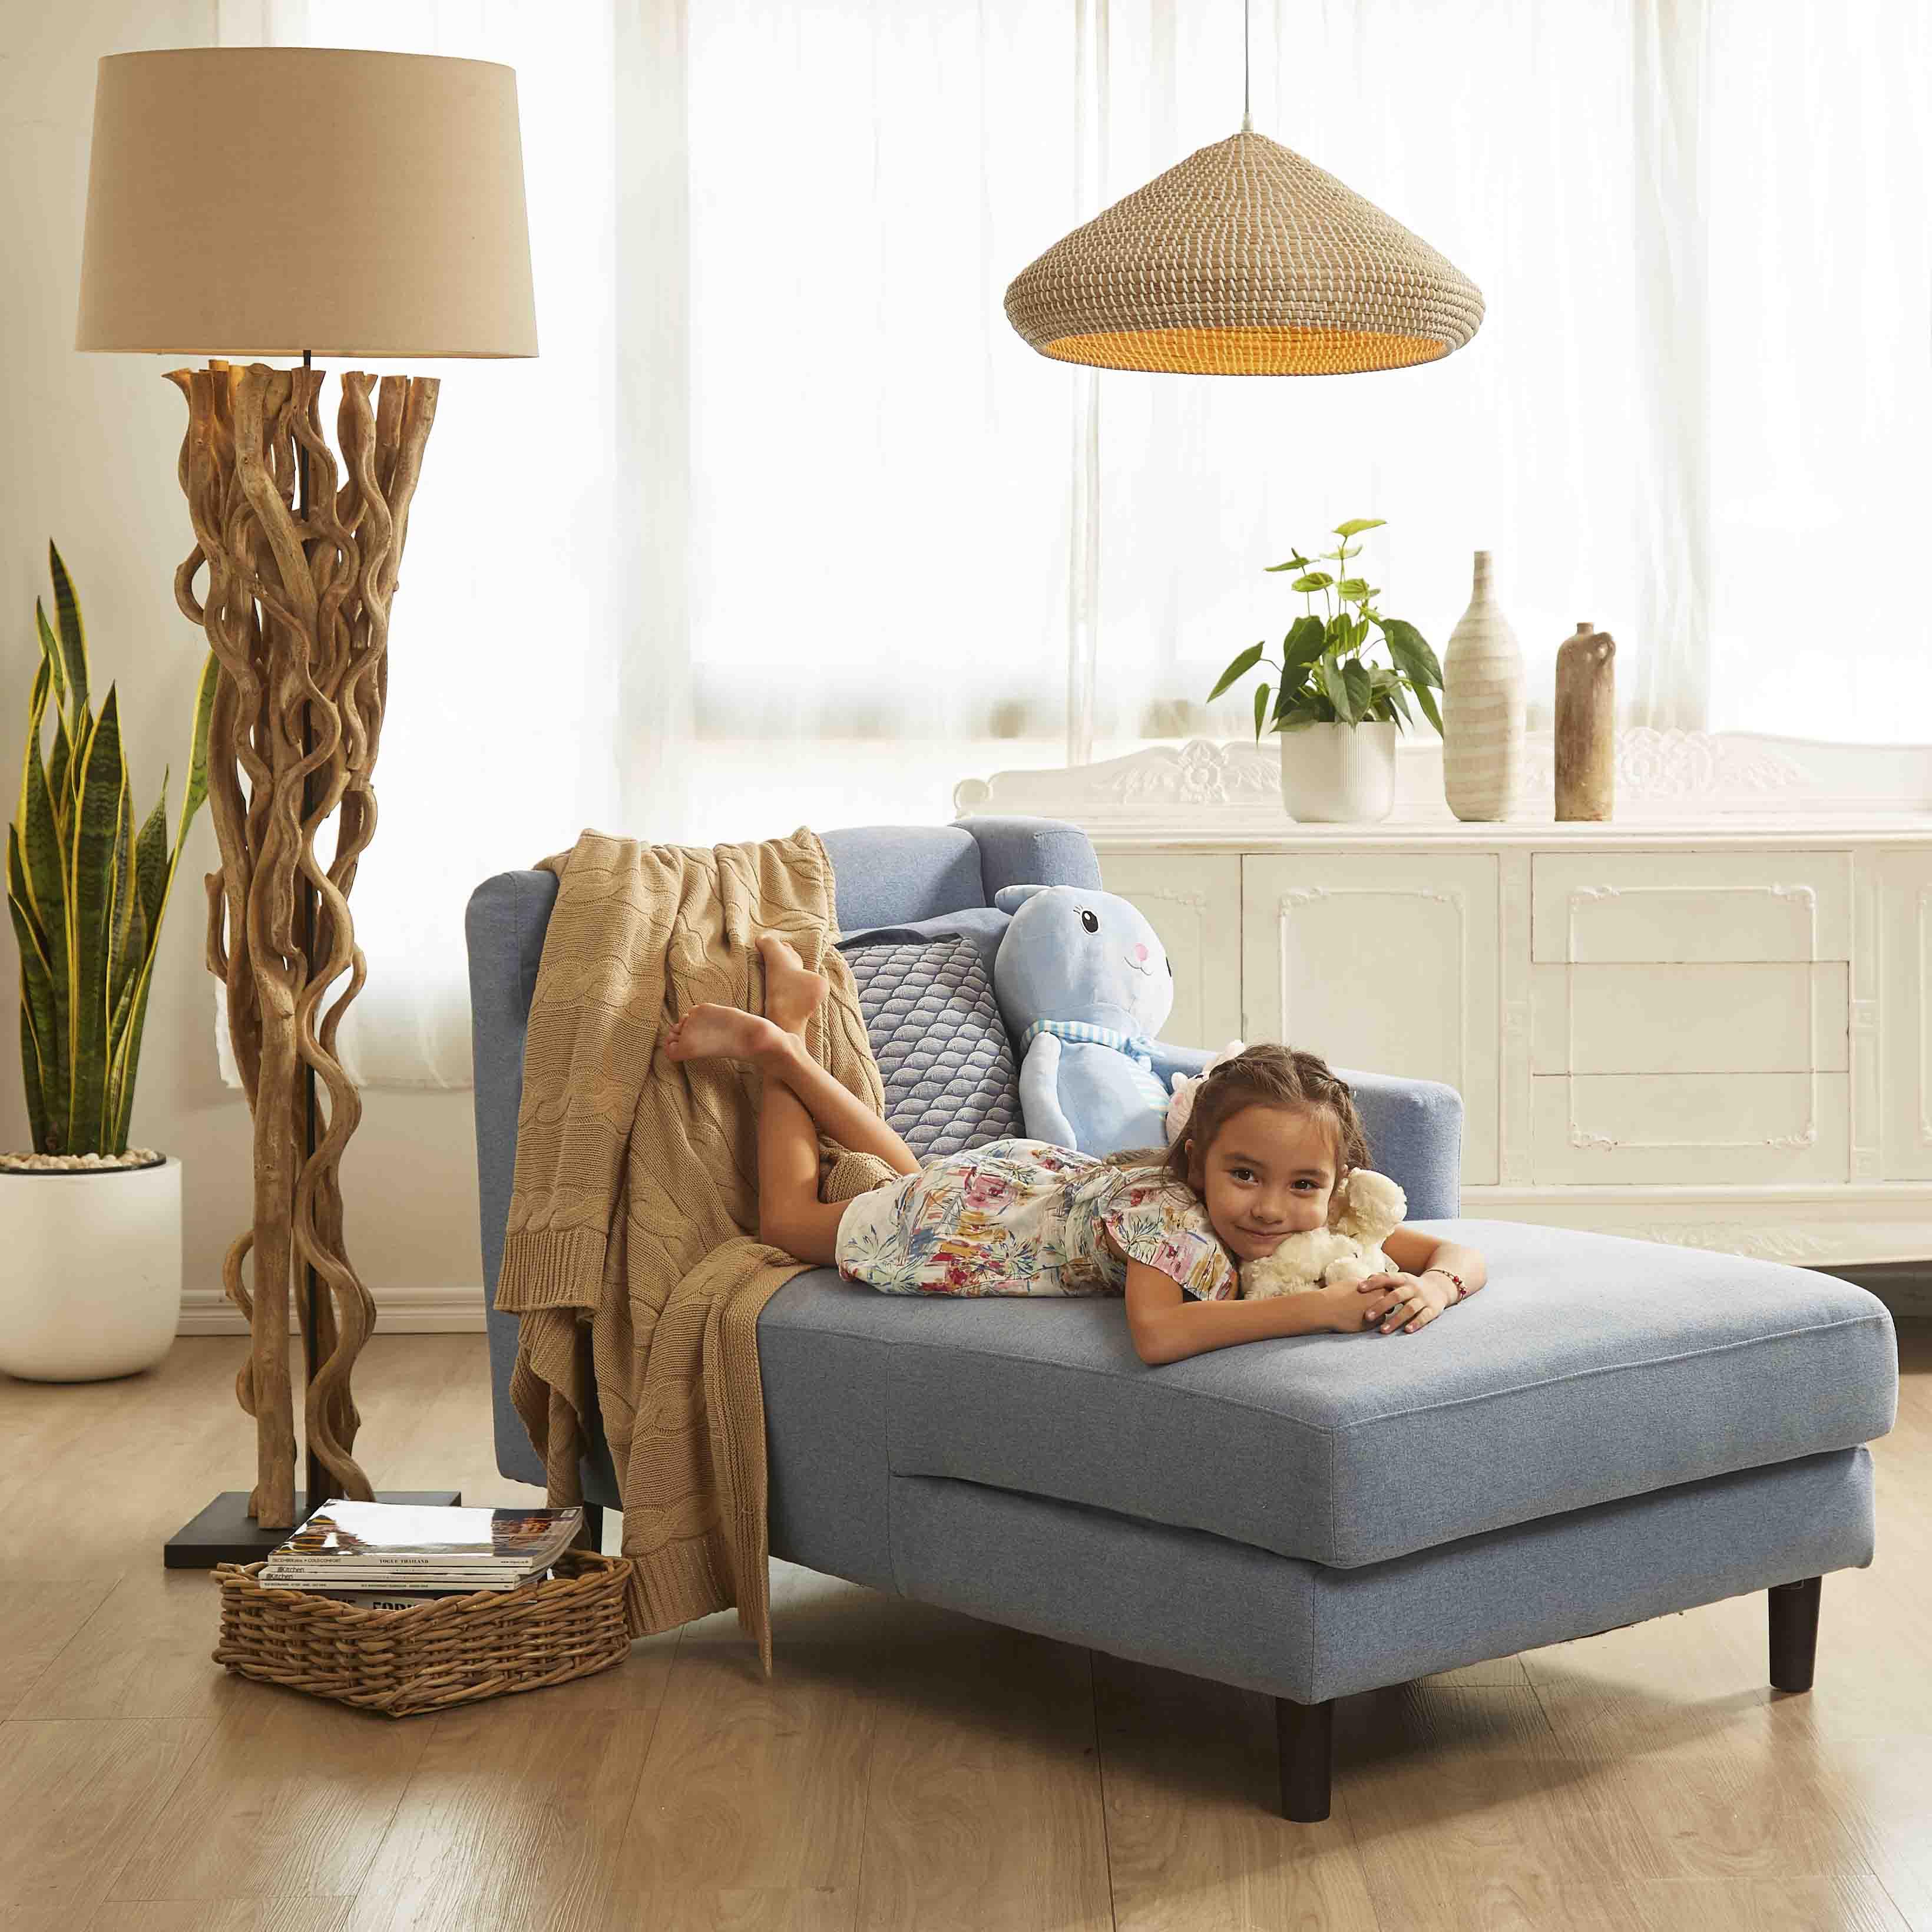 Scultura Caotico Floor Lamp product photo #1